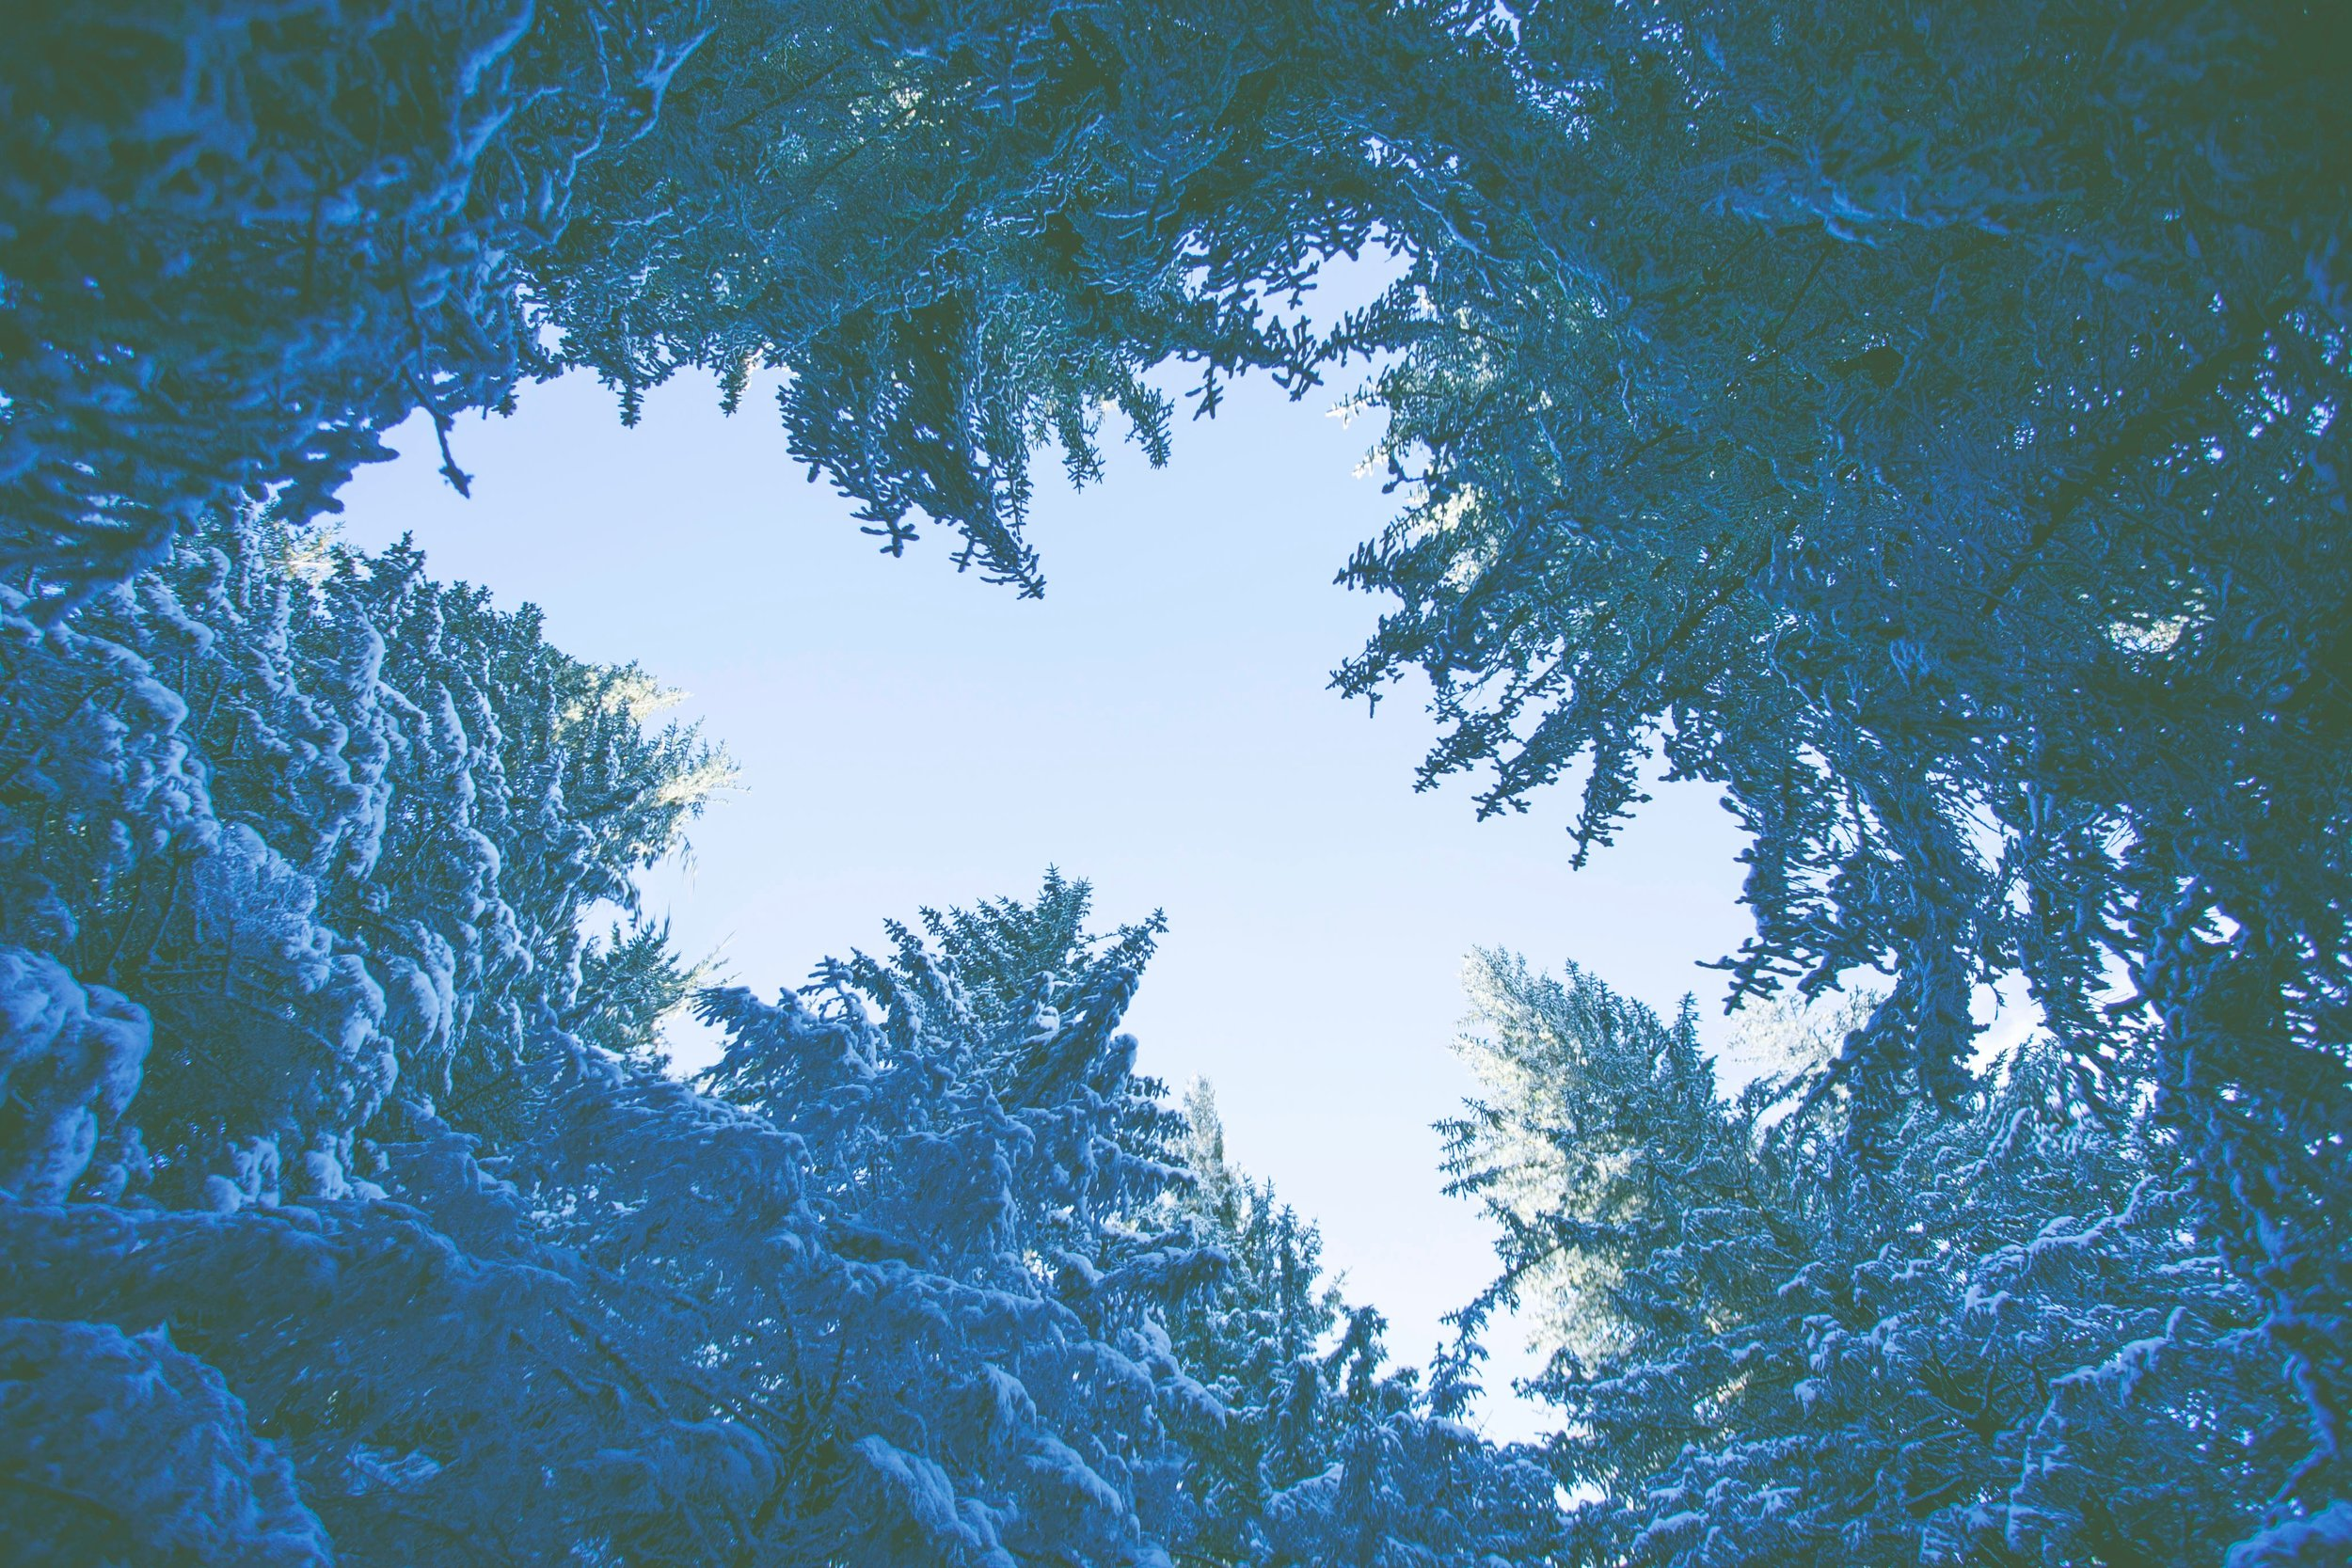 photo-nic-co-uk-nic-186211.jpg